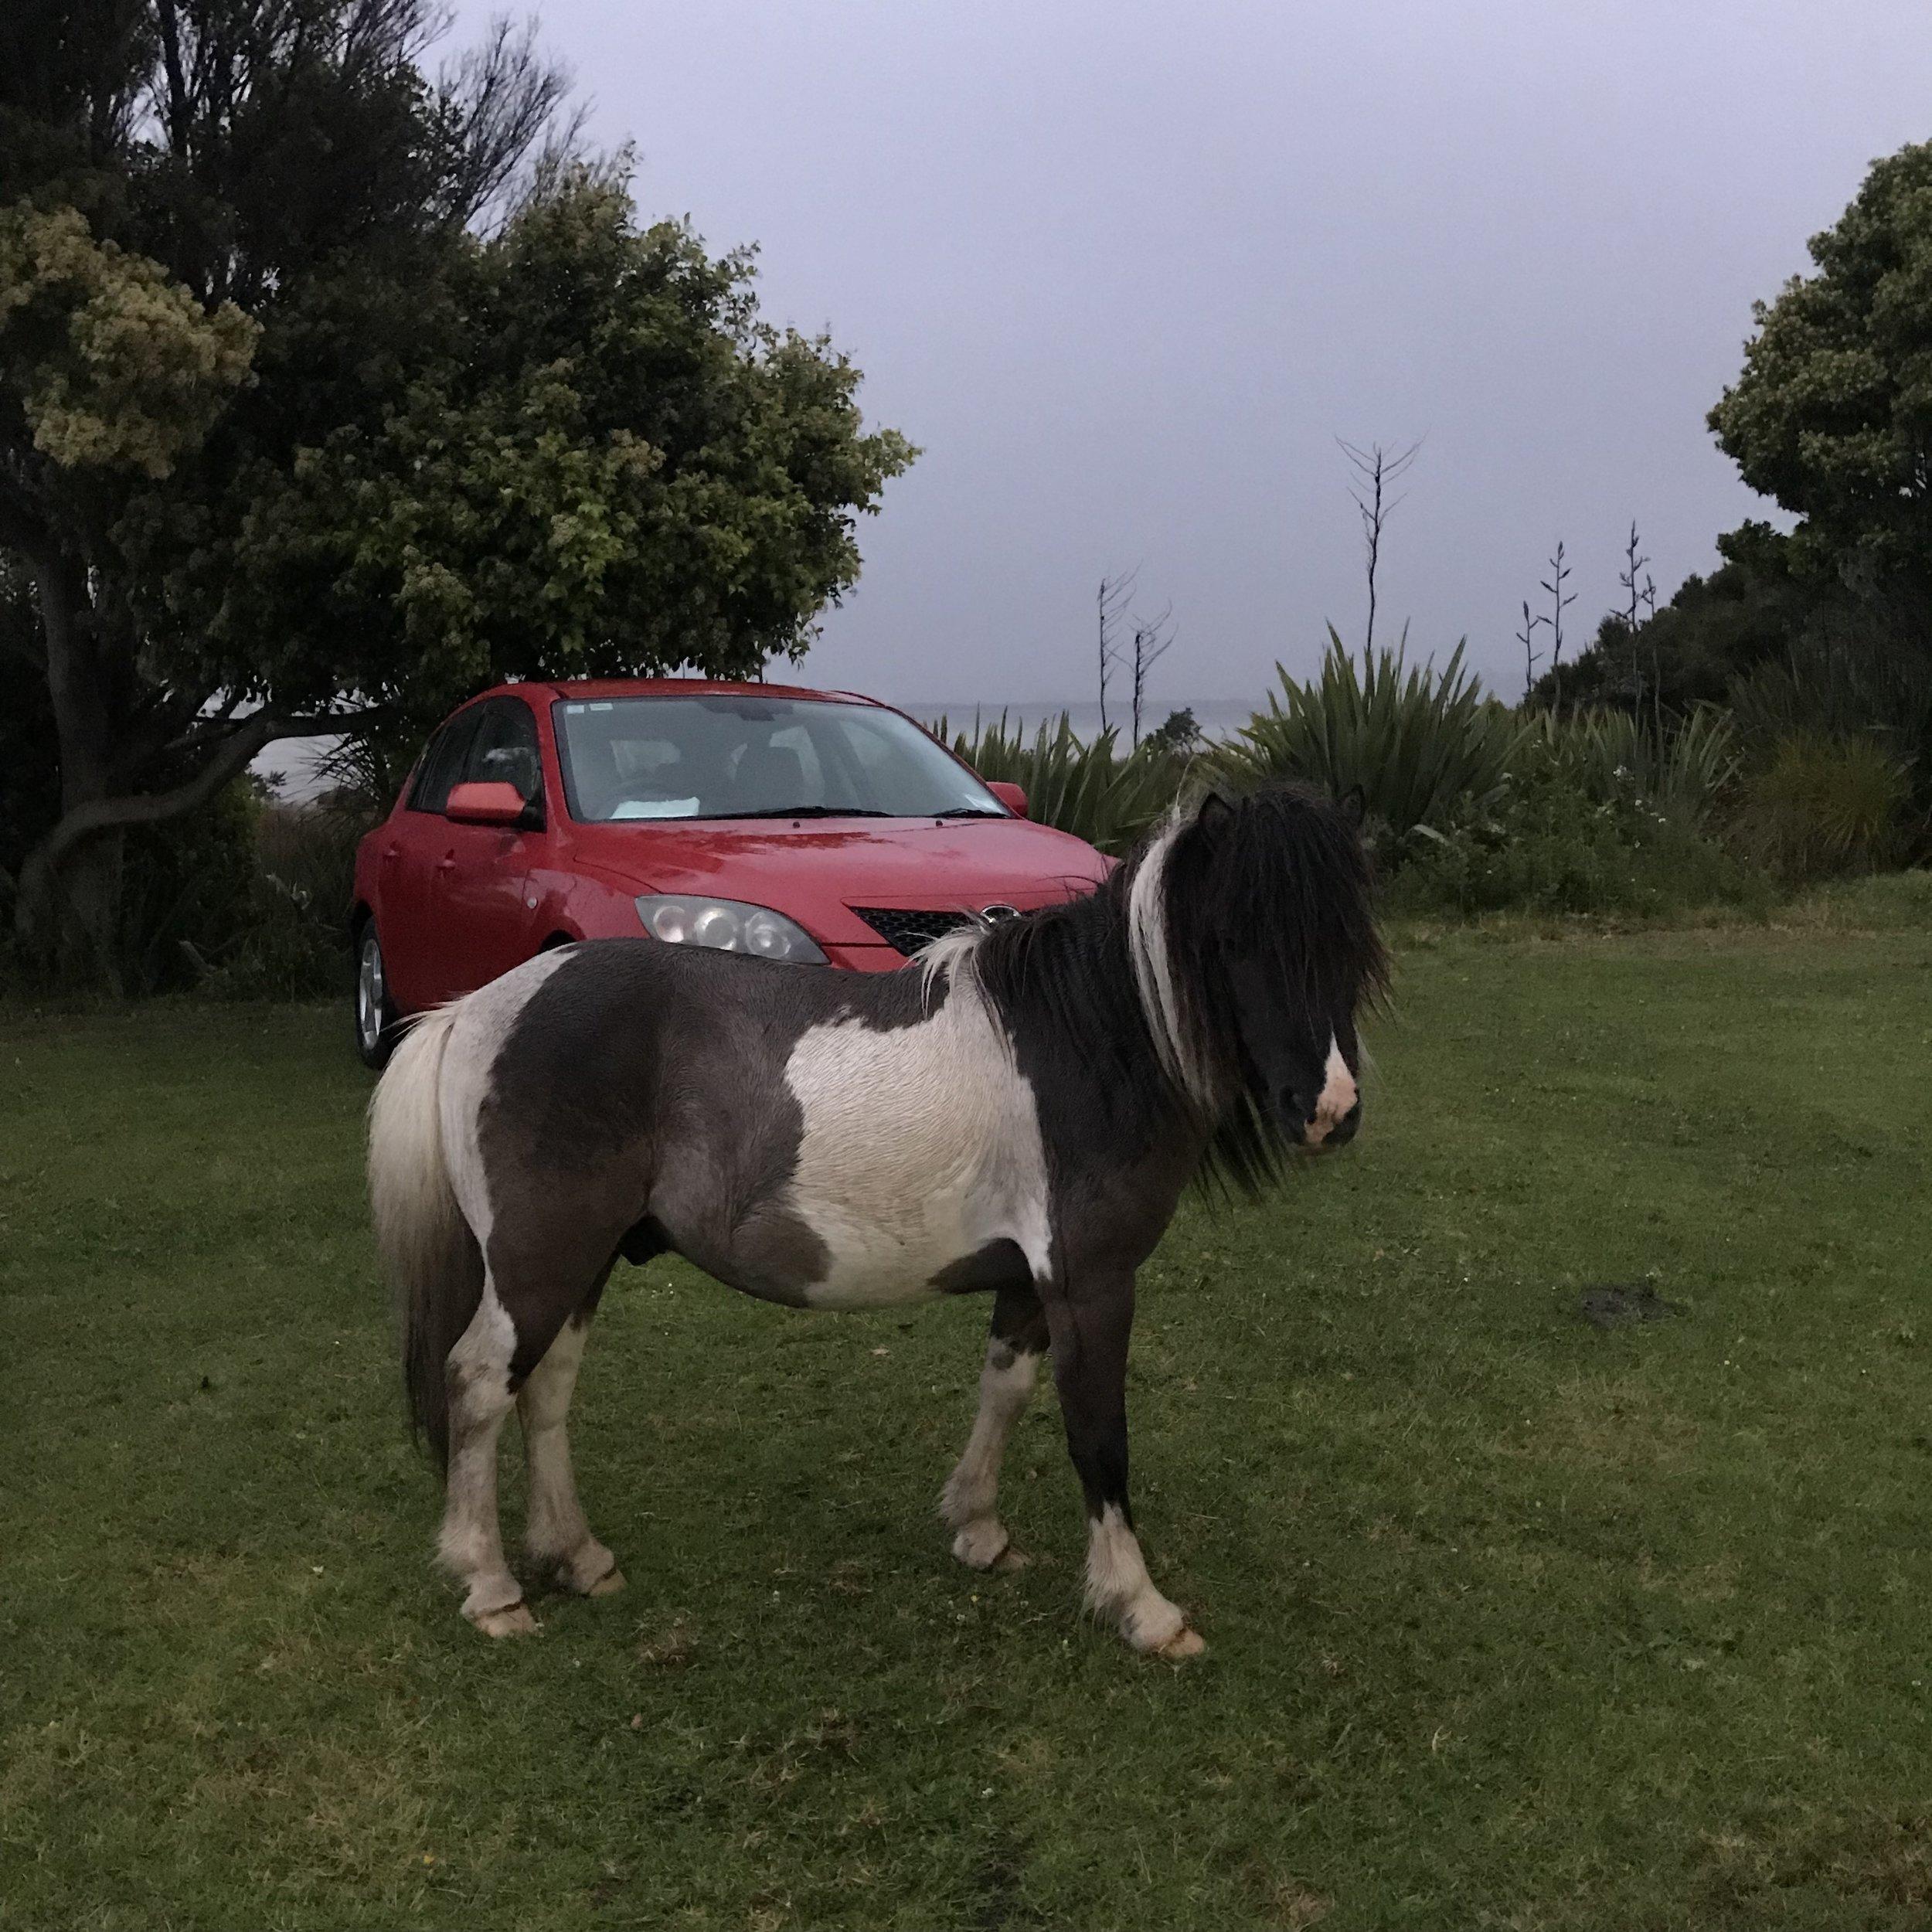 Te Hapua pony (image by Jacqui Gibson).